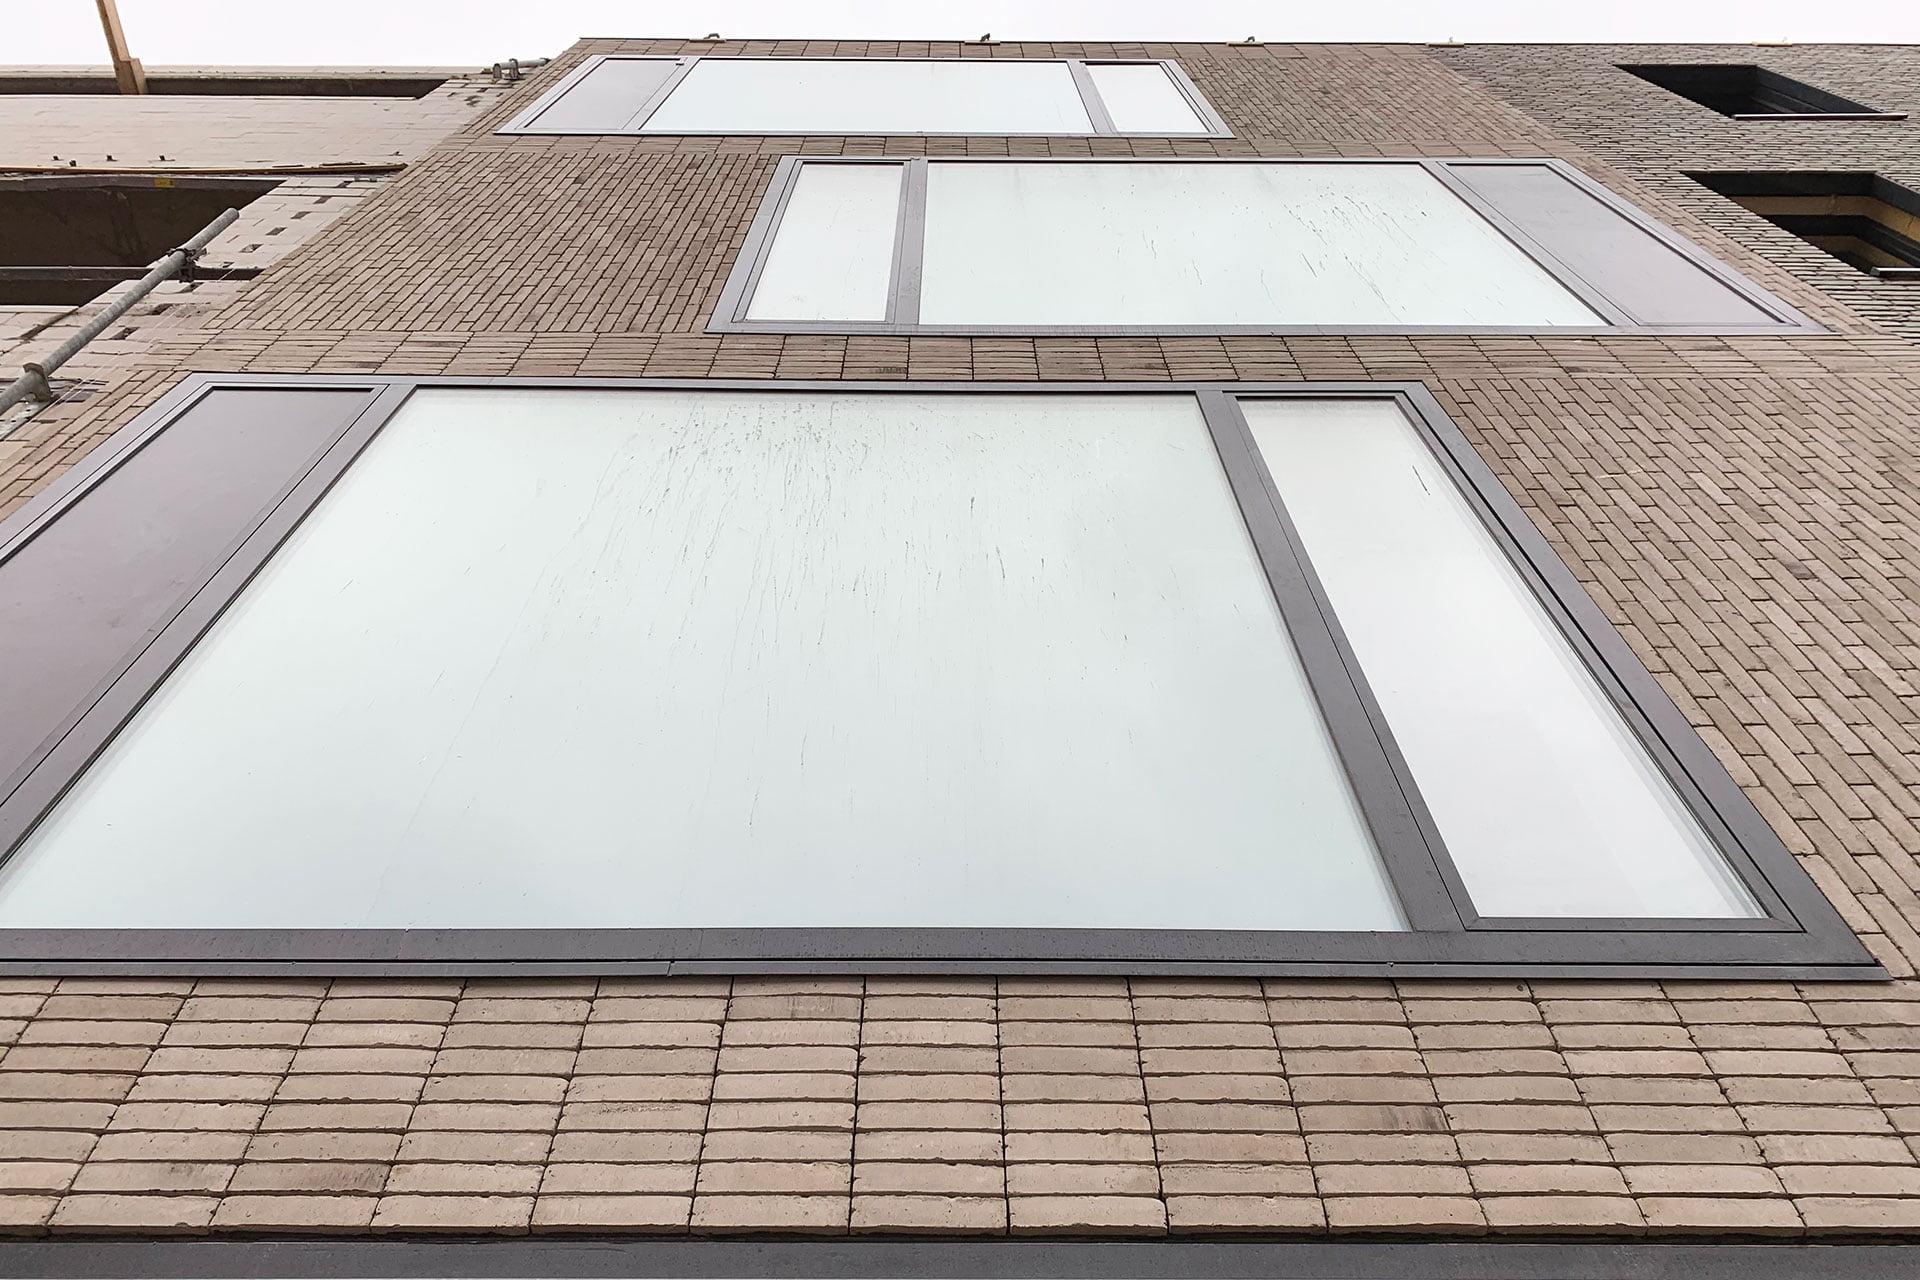 Loggia house 3 Karel Klinkenberg locatie Amsterdam Nieuw-West